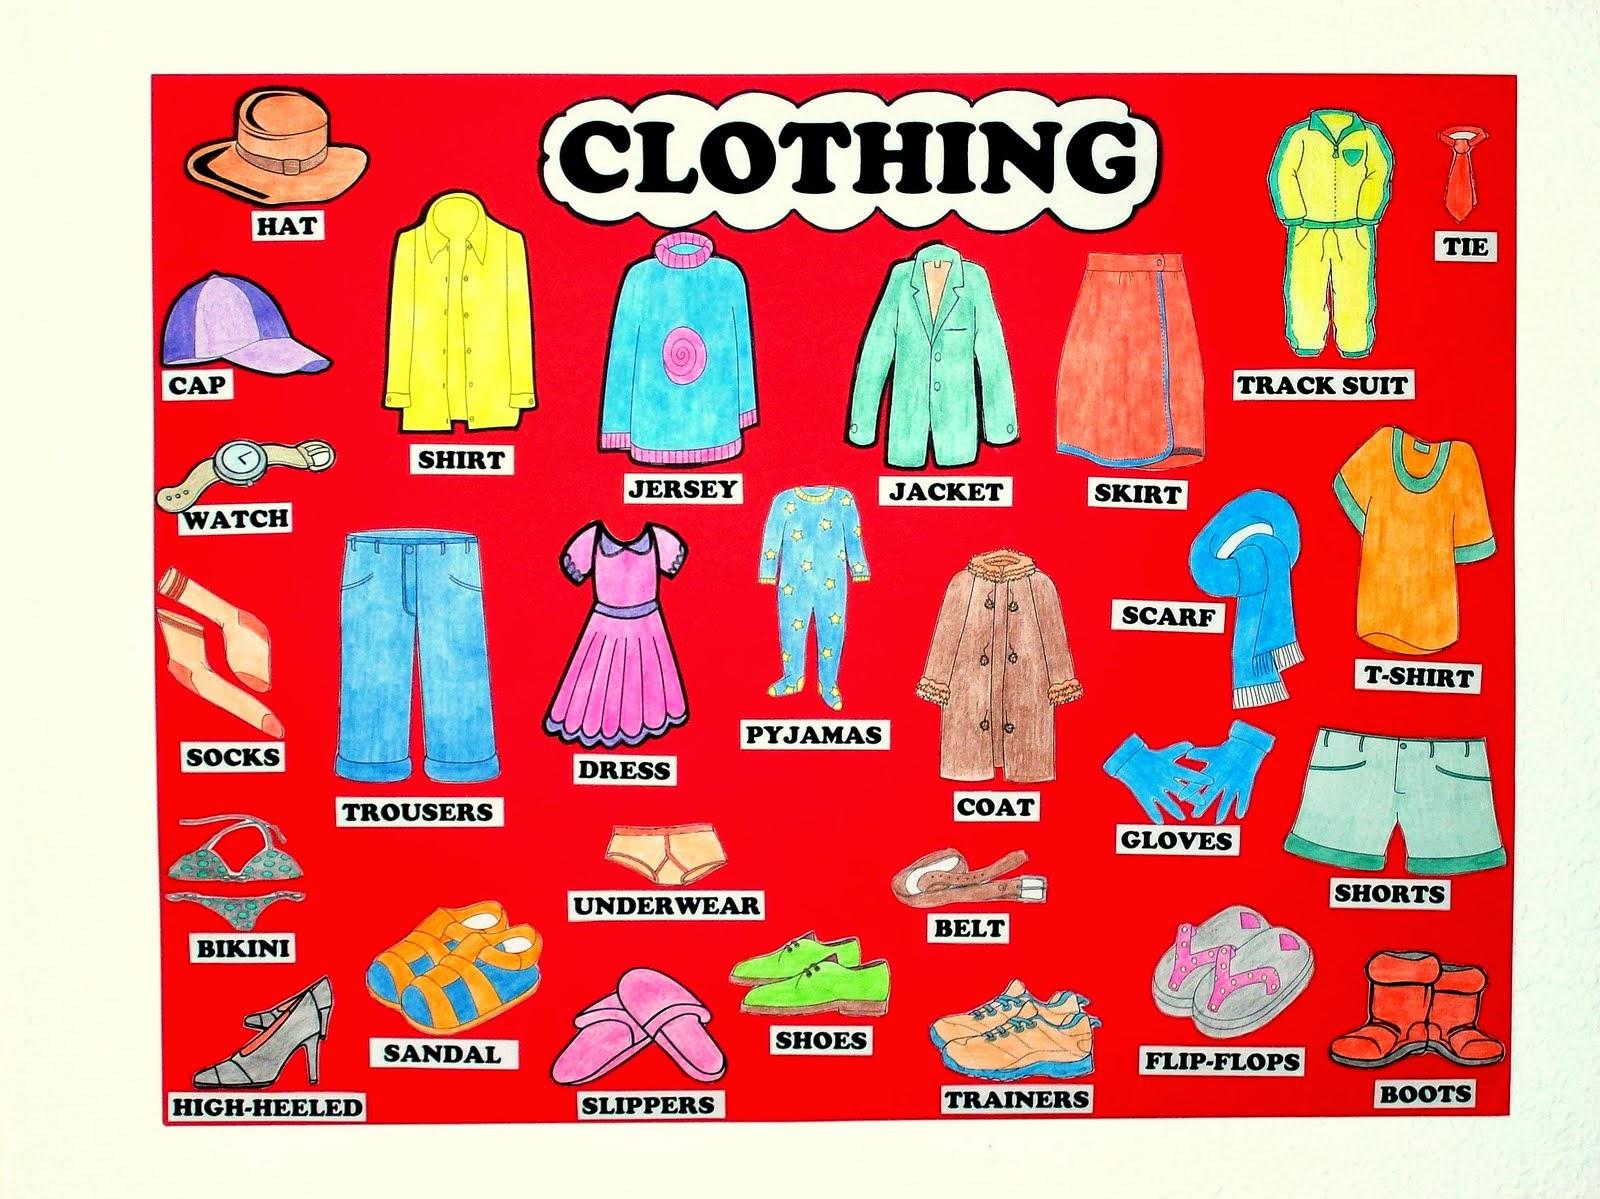 English course : Dibujos de prendas de vestir en ingles from personalpresentationofjuancaramirez.blogspot.com size 1600 x 1199 jpeg 346kB